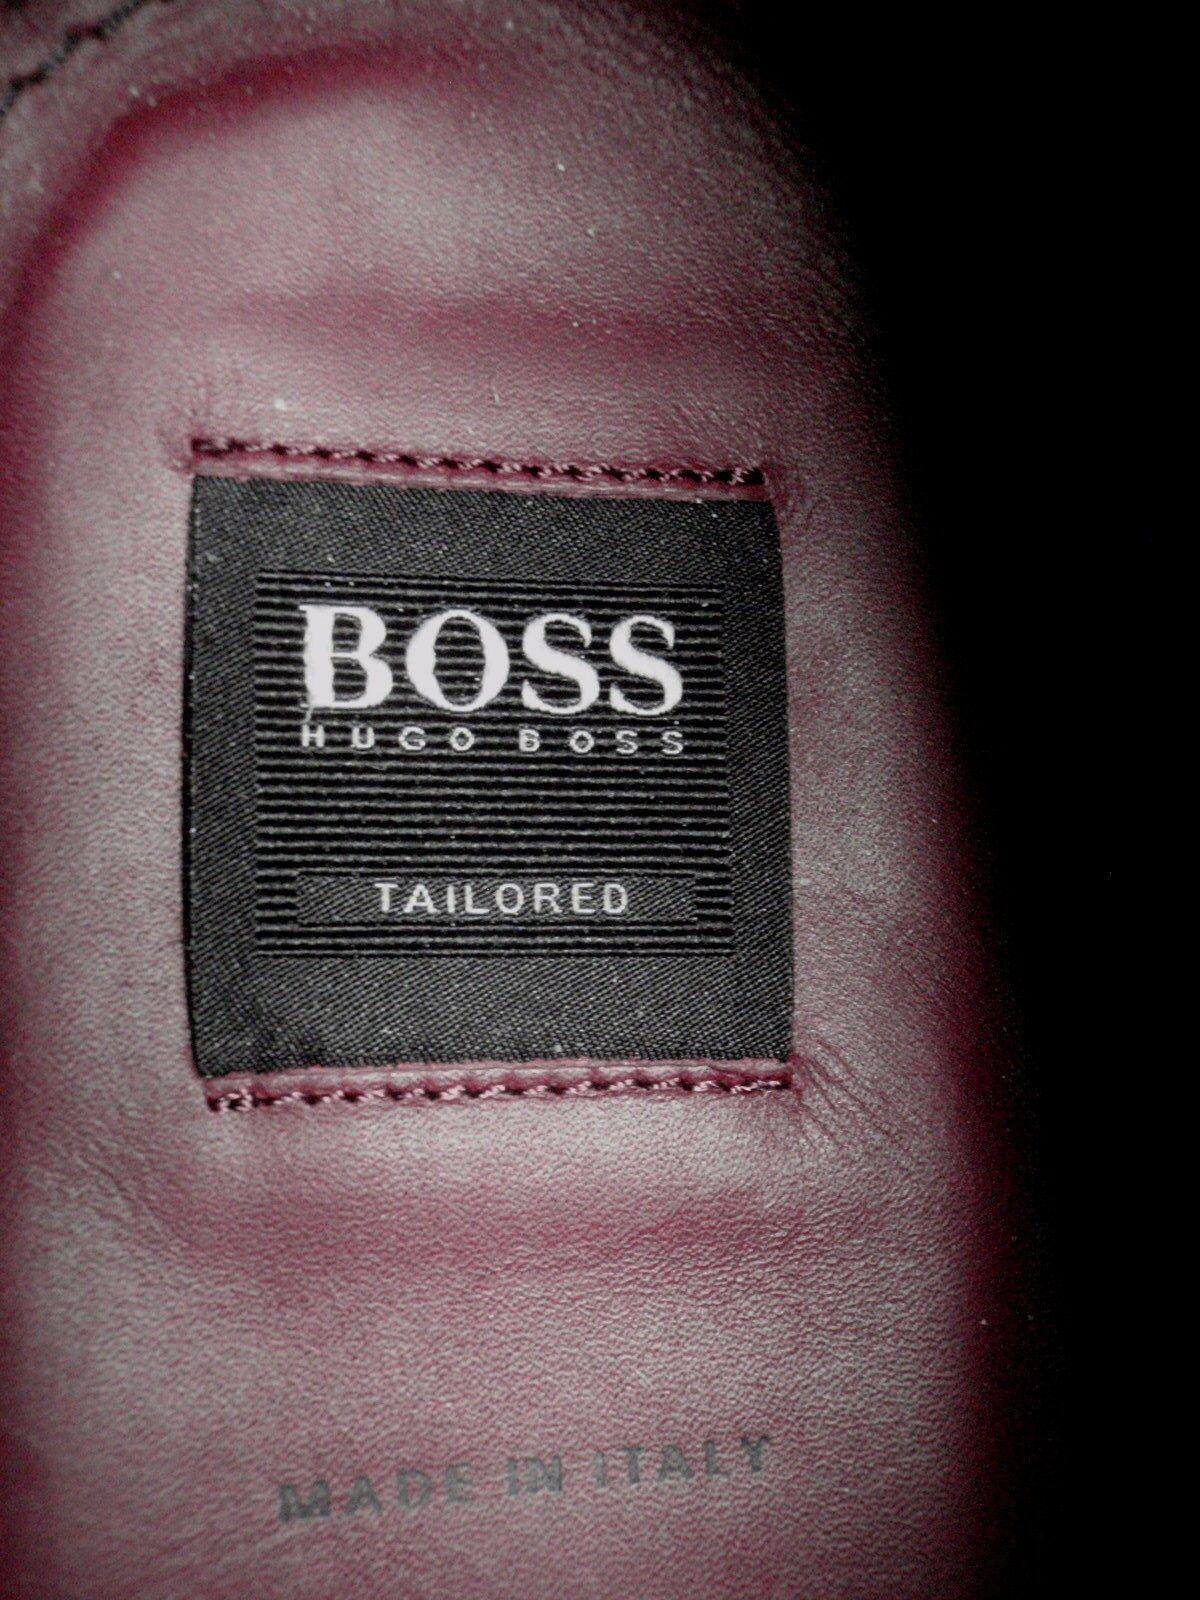 New HUGO BOSS TailoROT Wholecut Leder Lace Up Dark Braun Leder Wholecut Schuhes UK 11 40bc51